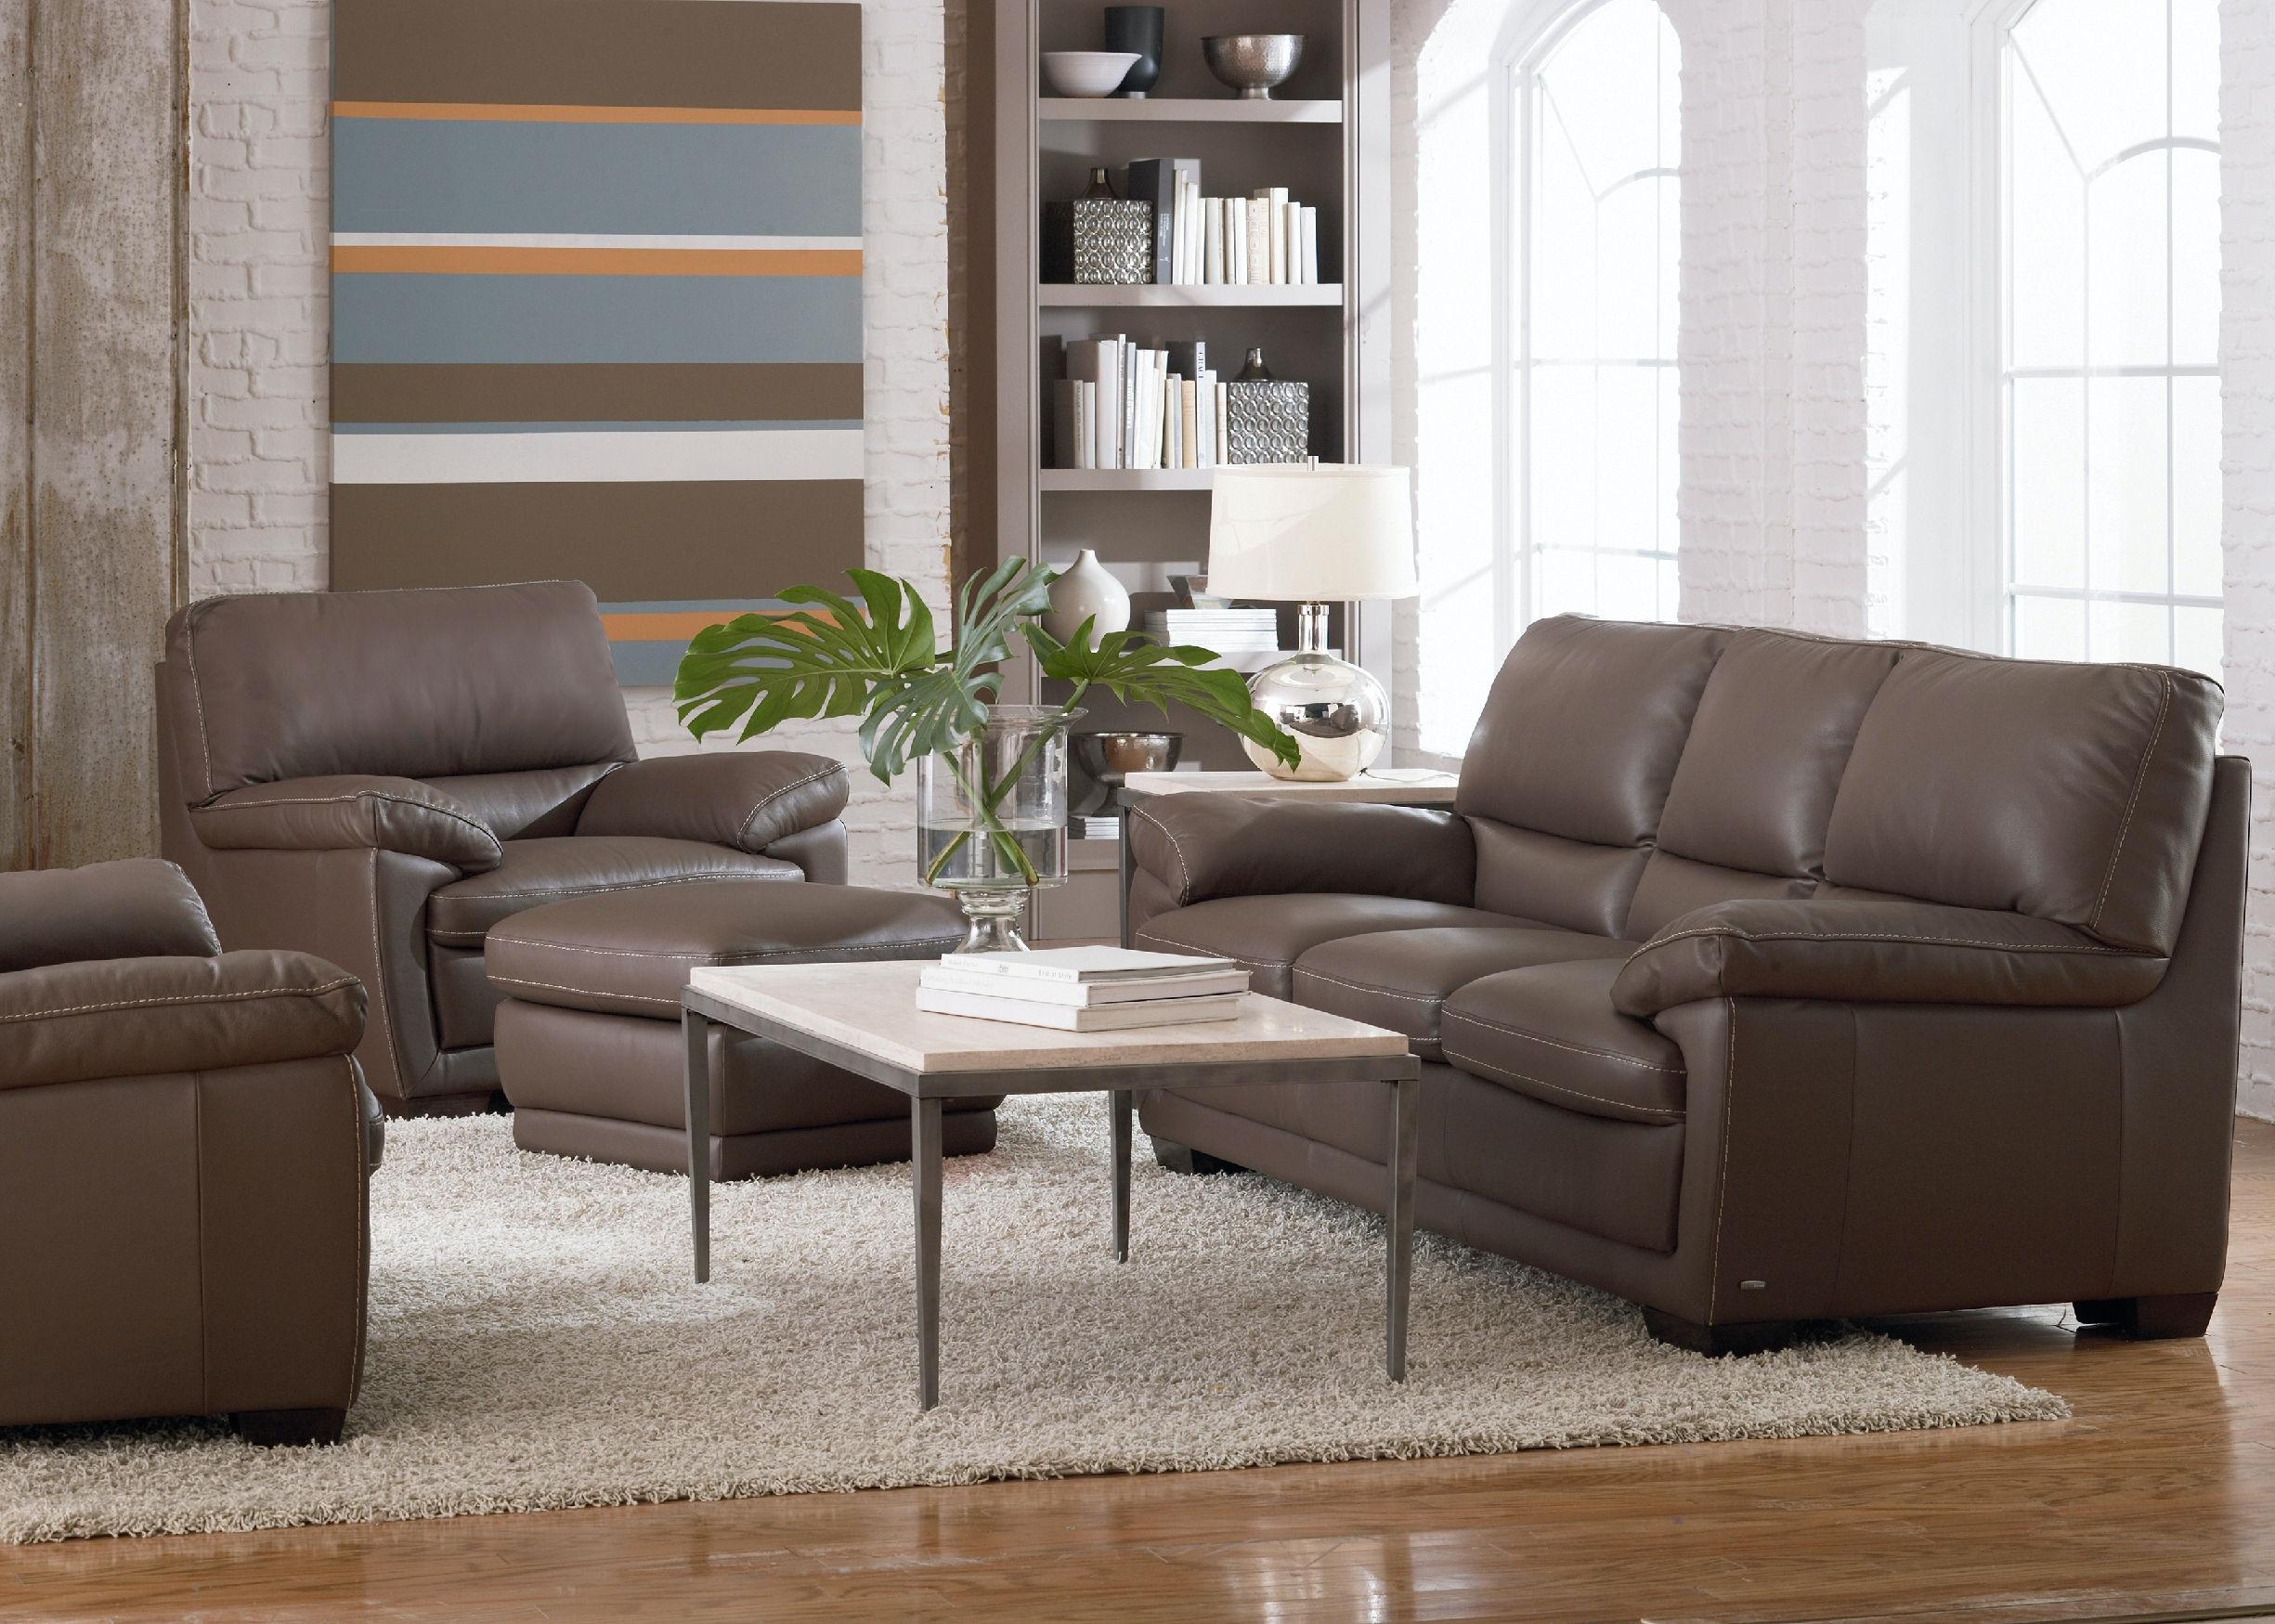 Denver Leather Sofa   DARK TAUPE ST:341188